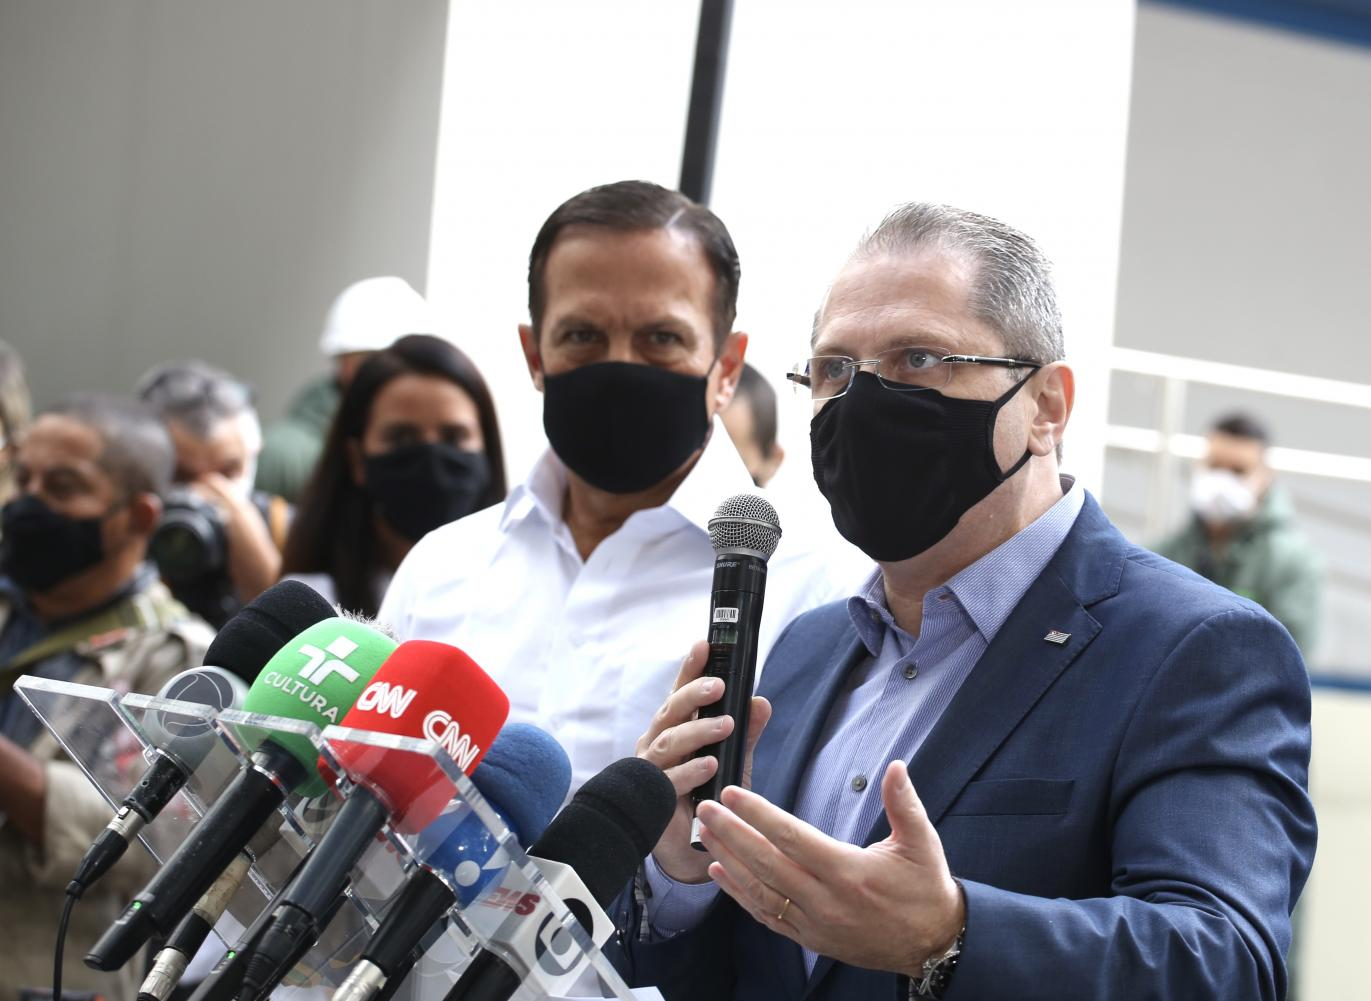 SP supera 80% de doses a ser entregues ao Brasil até o final de abril